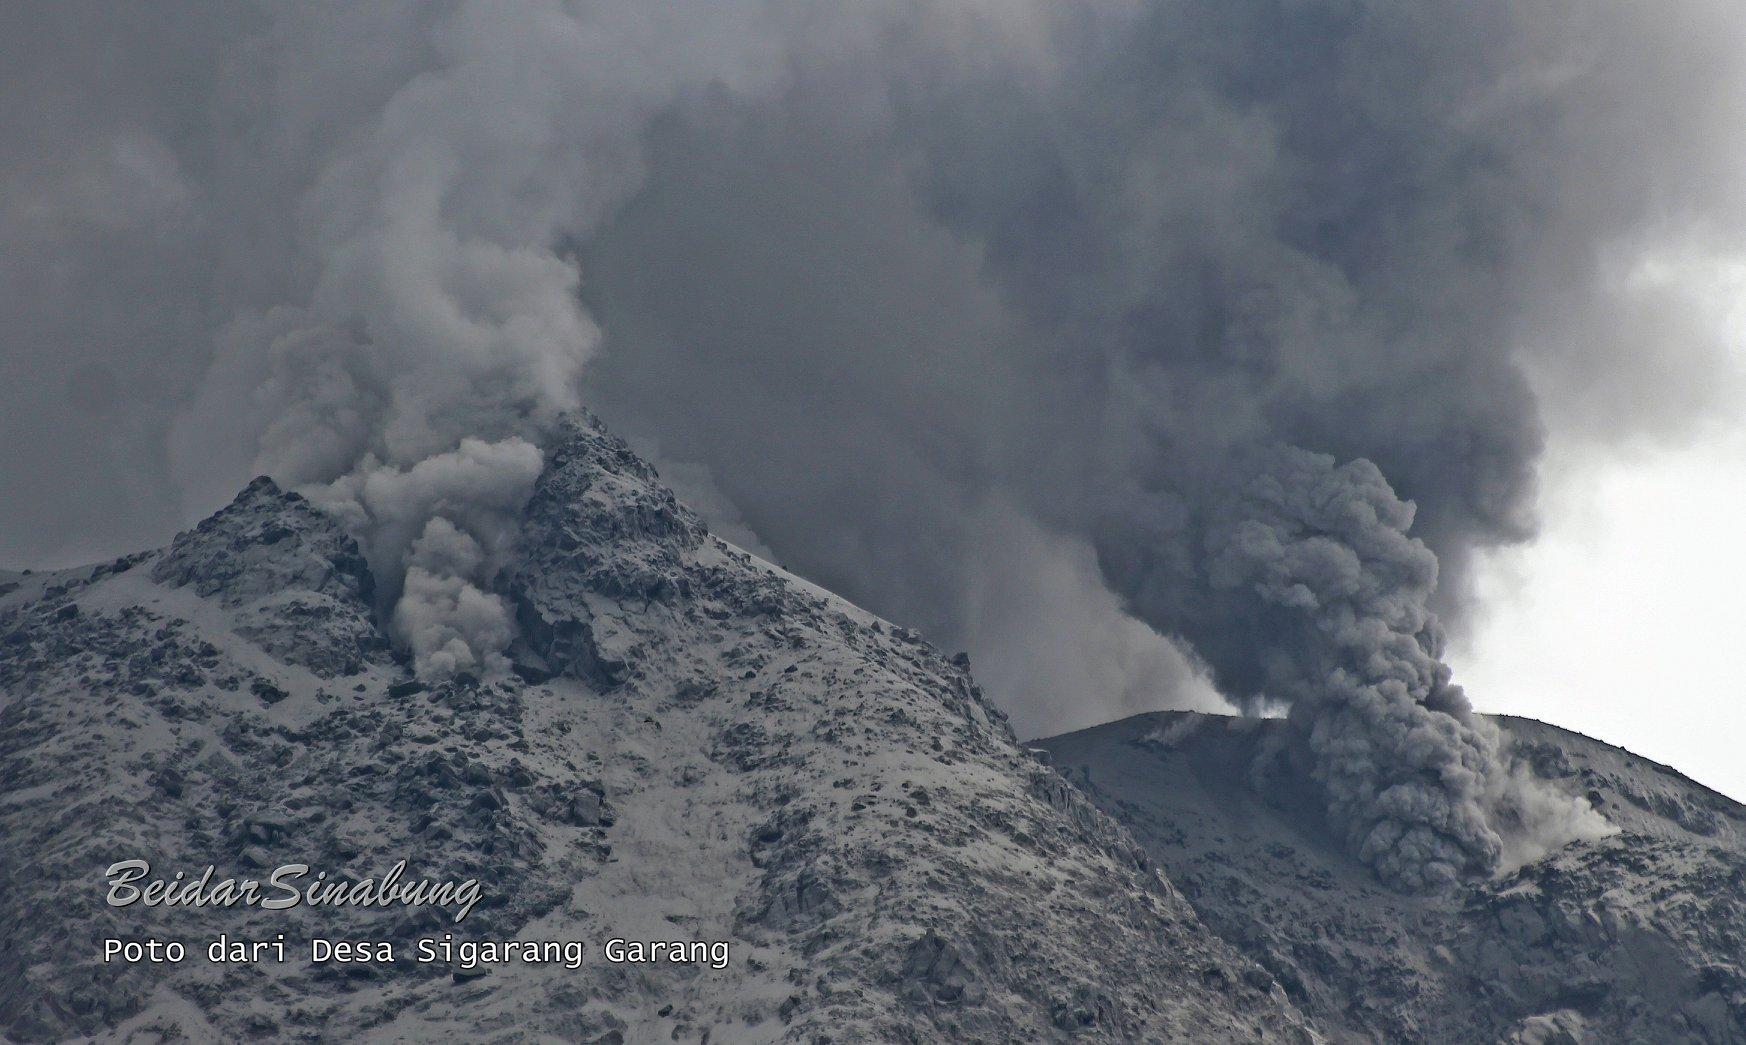 September 05, 2020. EN. Russia / Kurile Islands : Ebeko , Indonesia : Sinabung , Ecuador : Sangay / Cotopaxi / Cayambe , Iceland : Reykjanes Peninsula .